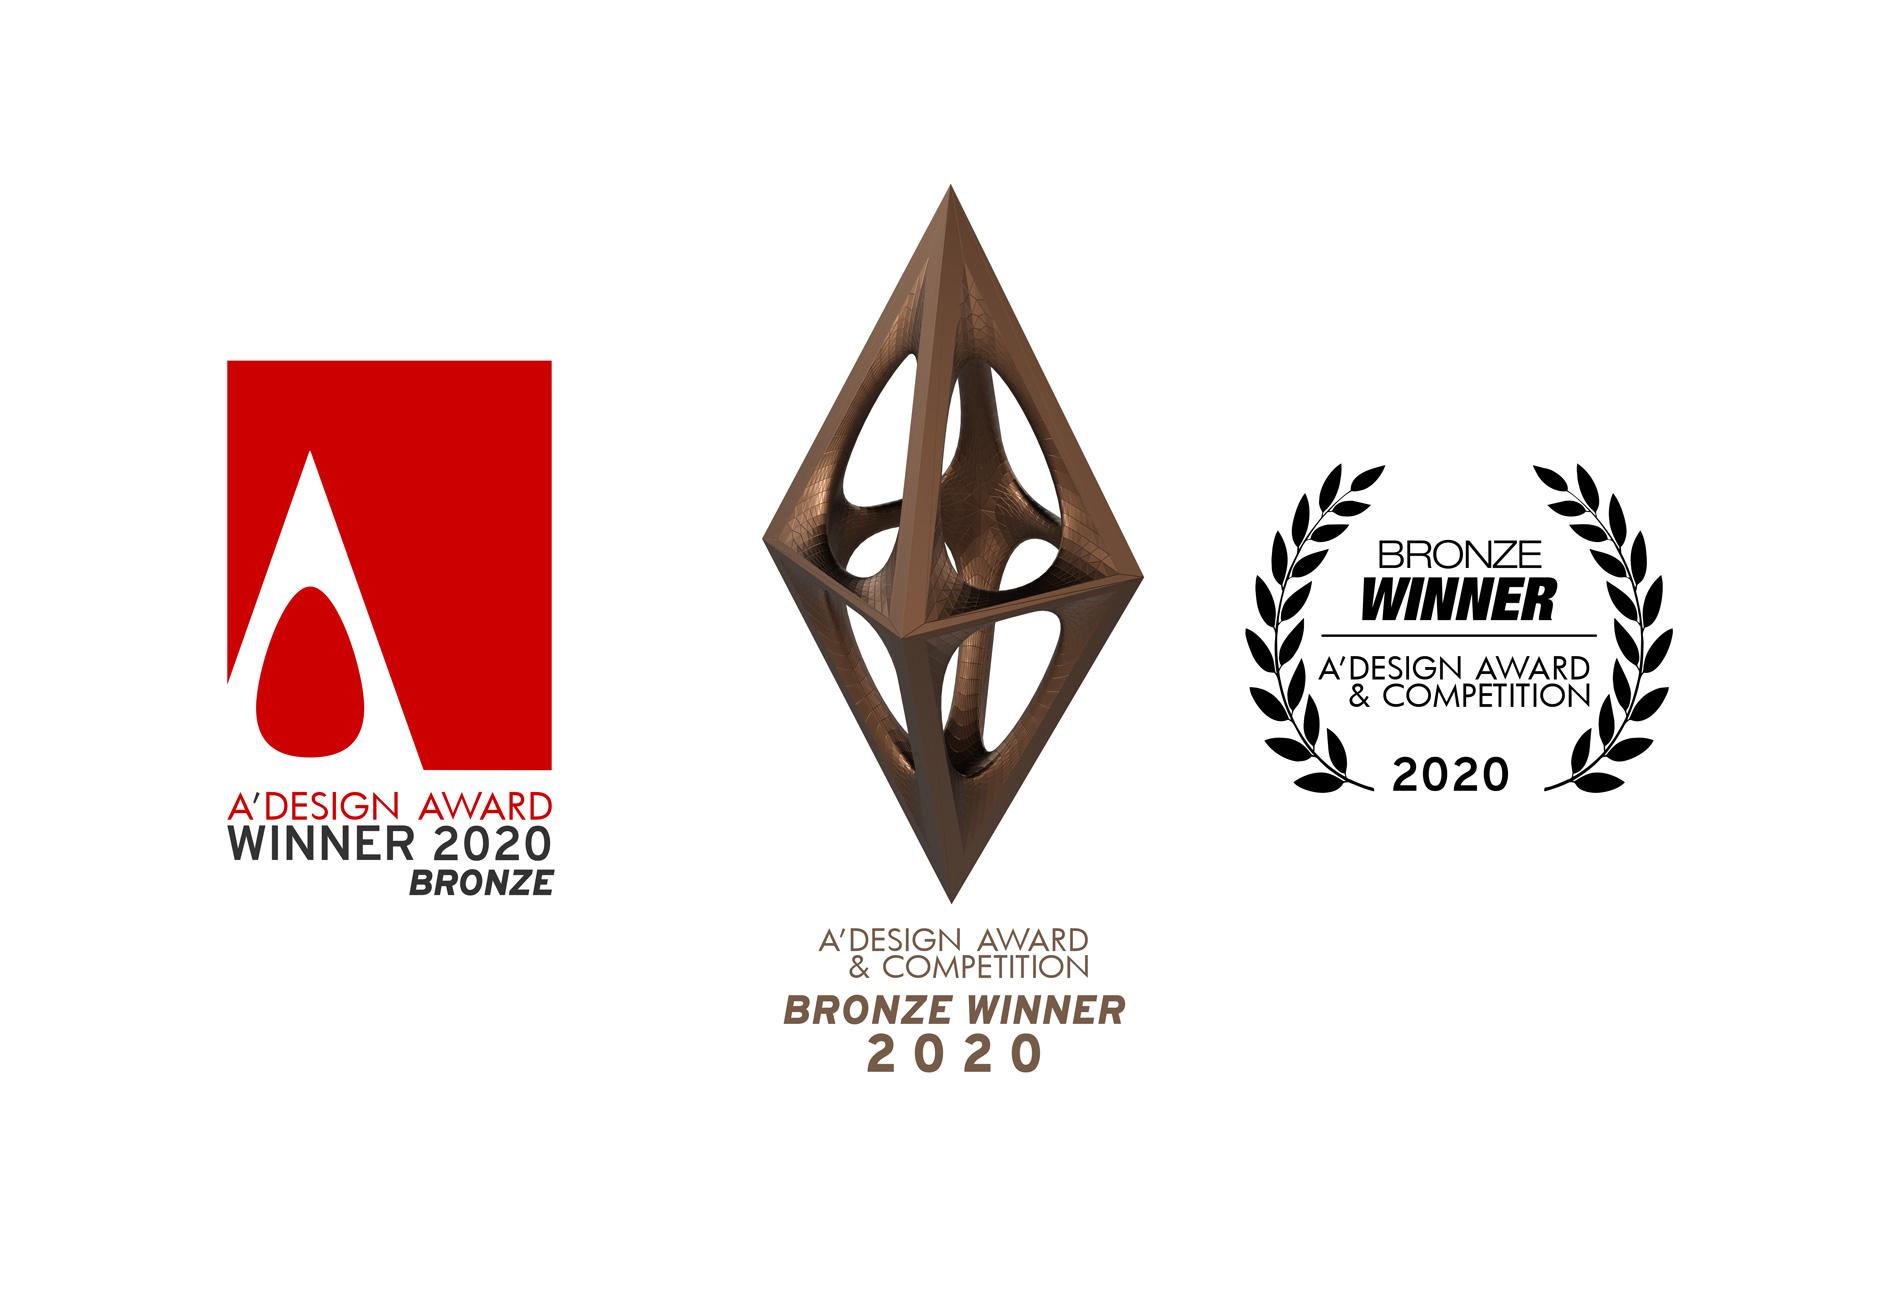 A'Design Award Bronze Logo Set